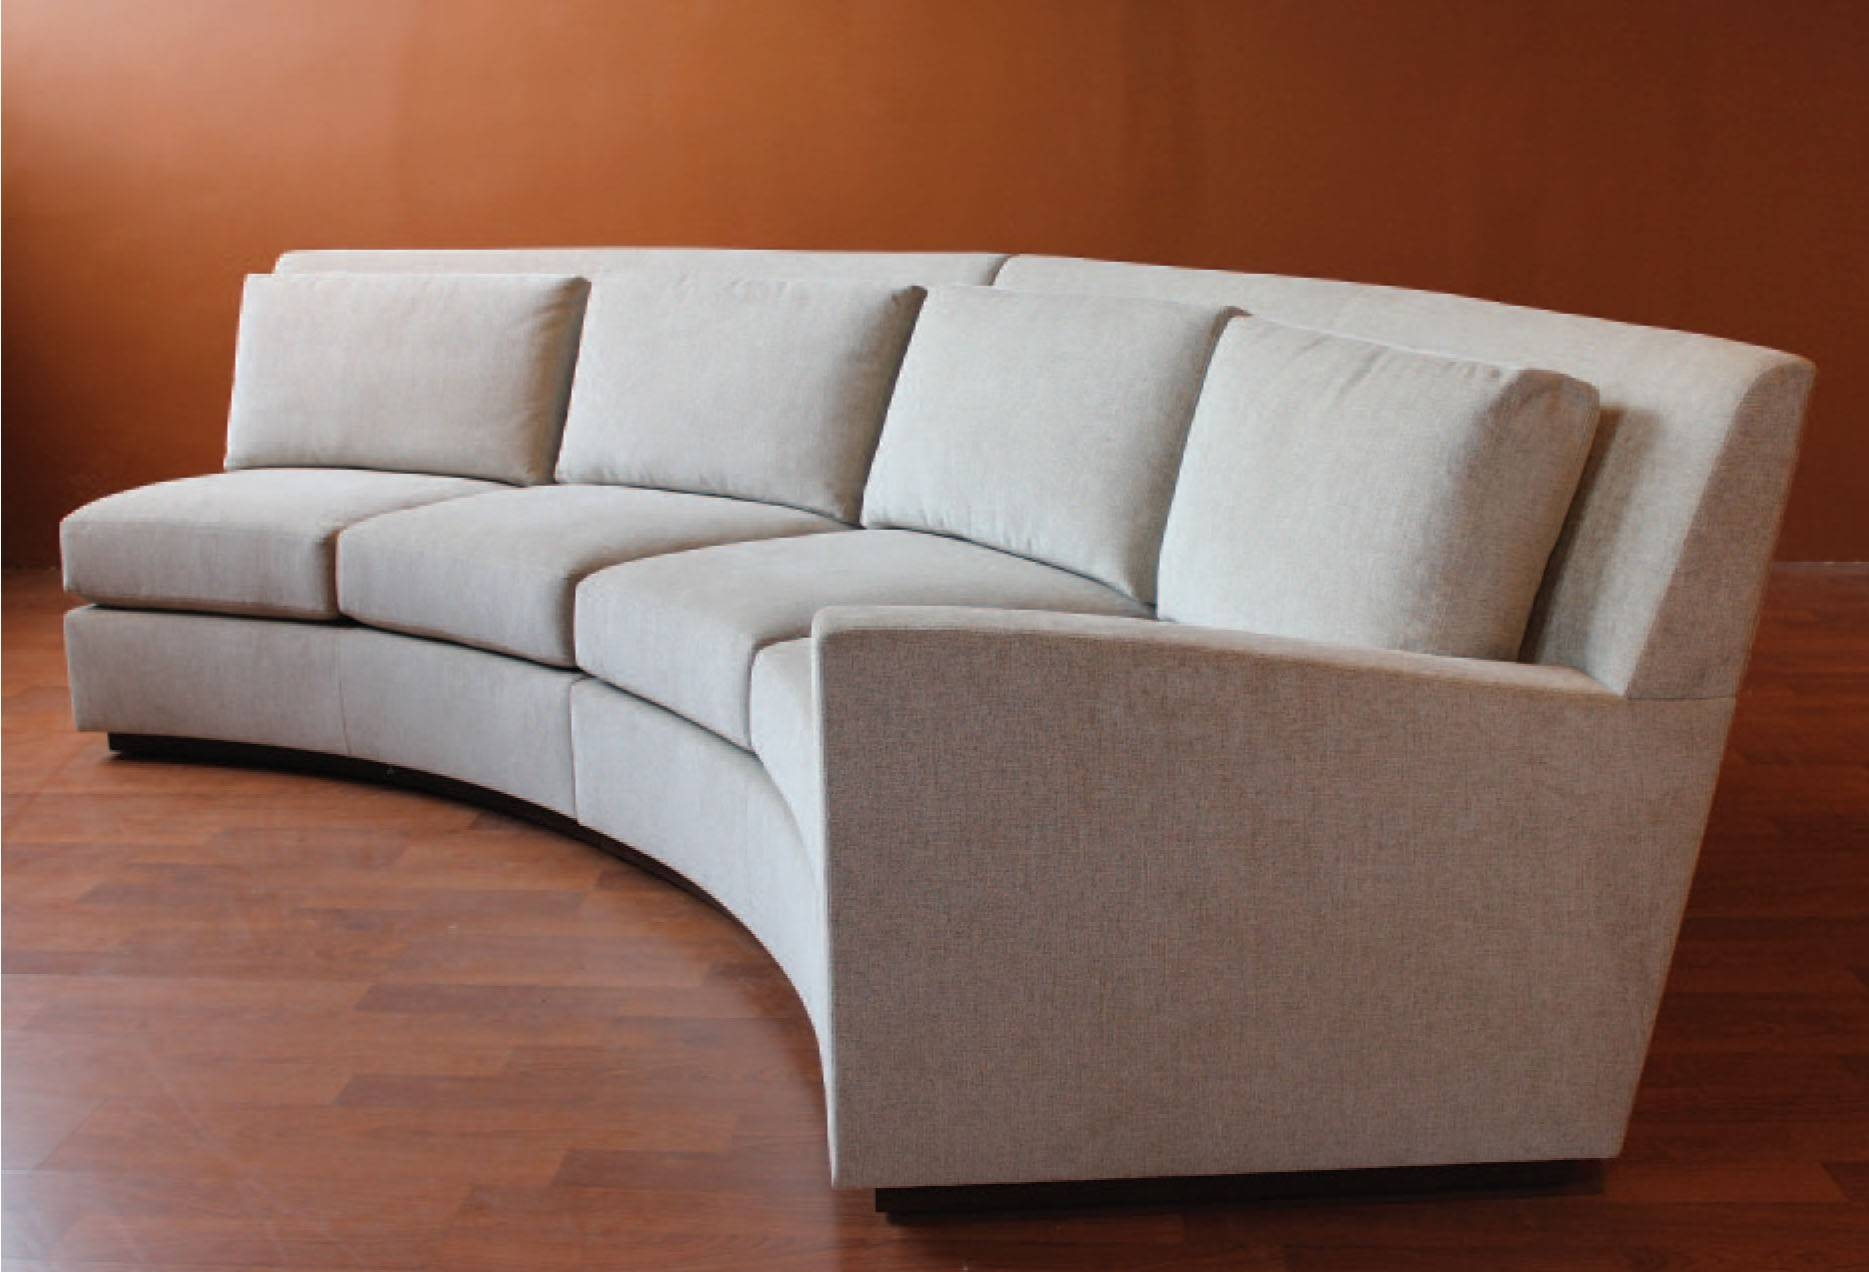 circular sofas yakoe 4 seater rattan sofa set black 15 photos semi round sectional